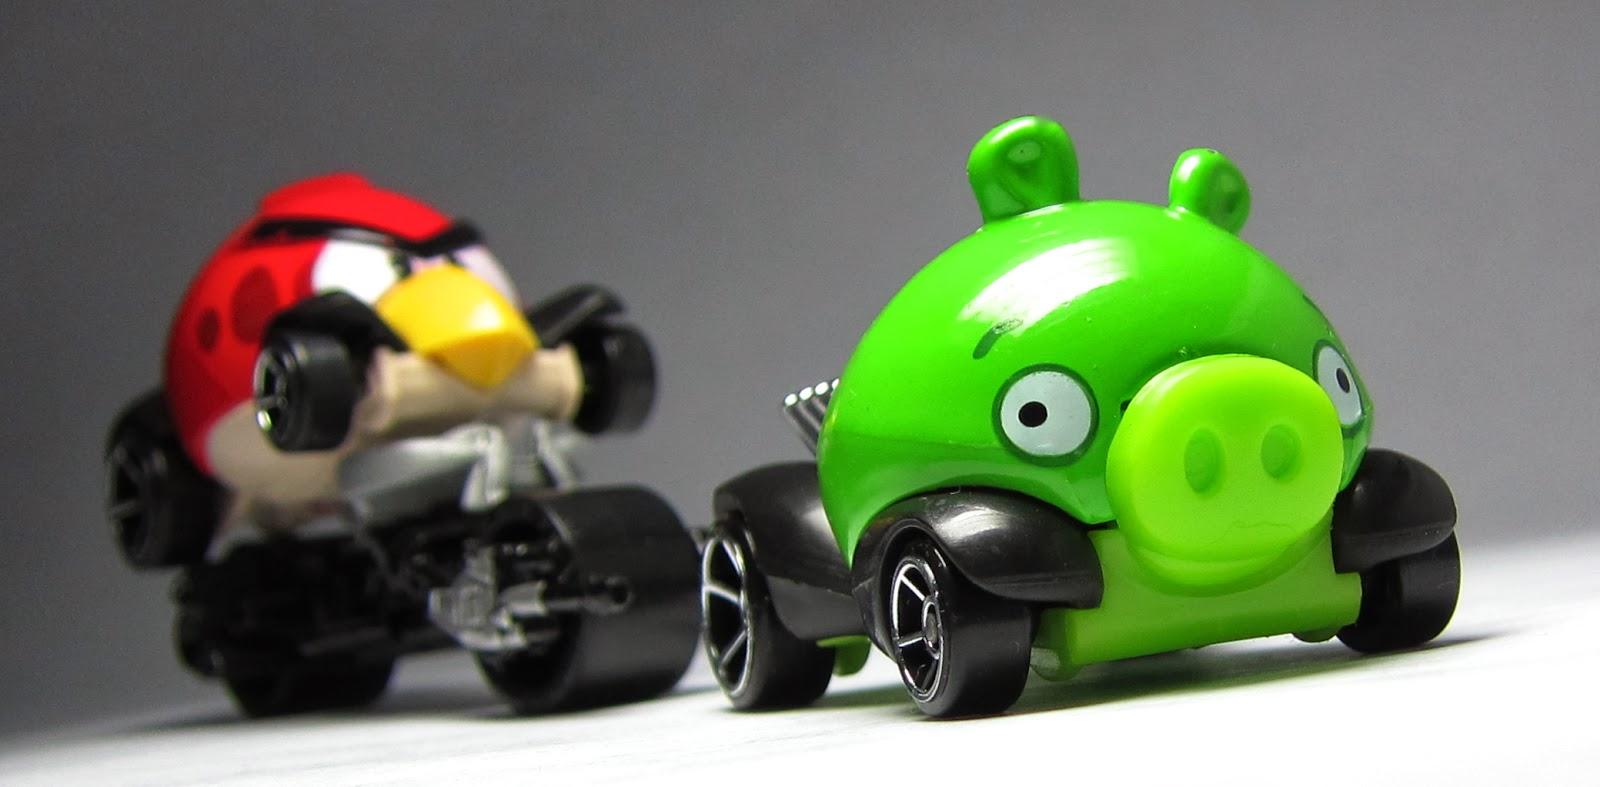 First Look  Hot Wheels Batman Bat Pod Angry Birds Red Bird Minion Pig And A Brand New Wheel